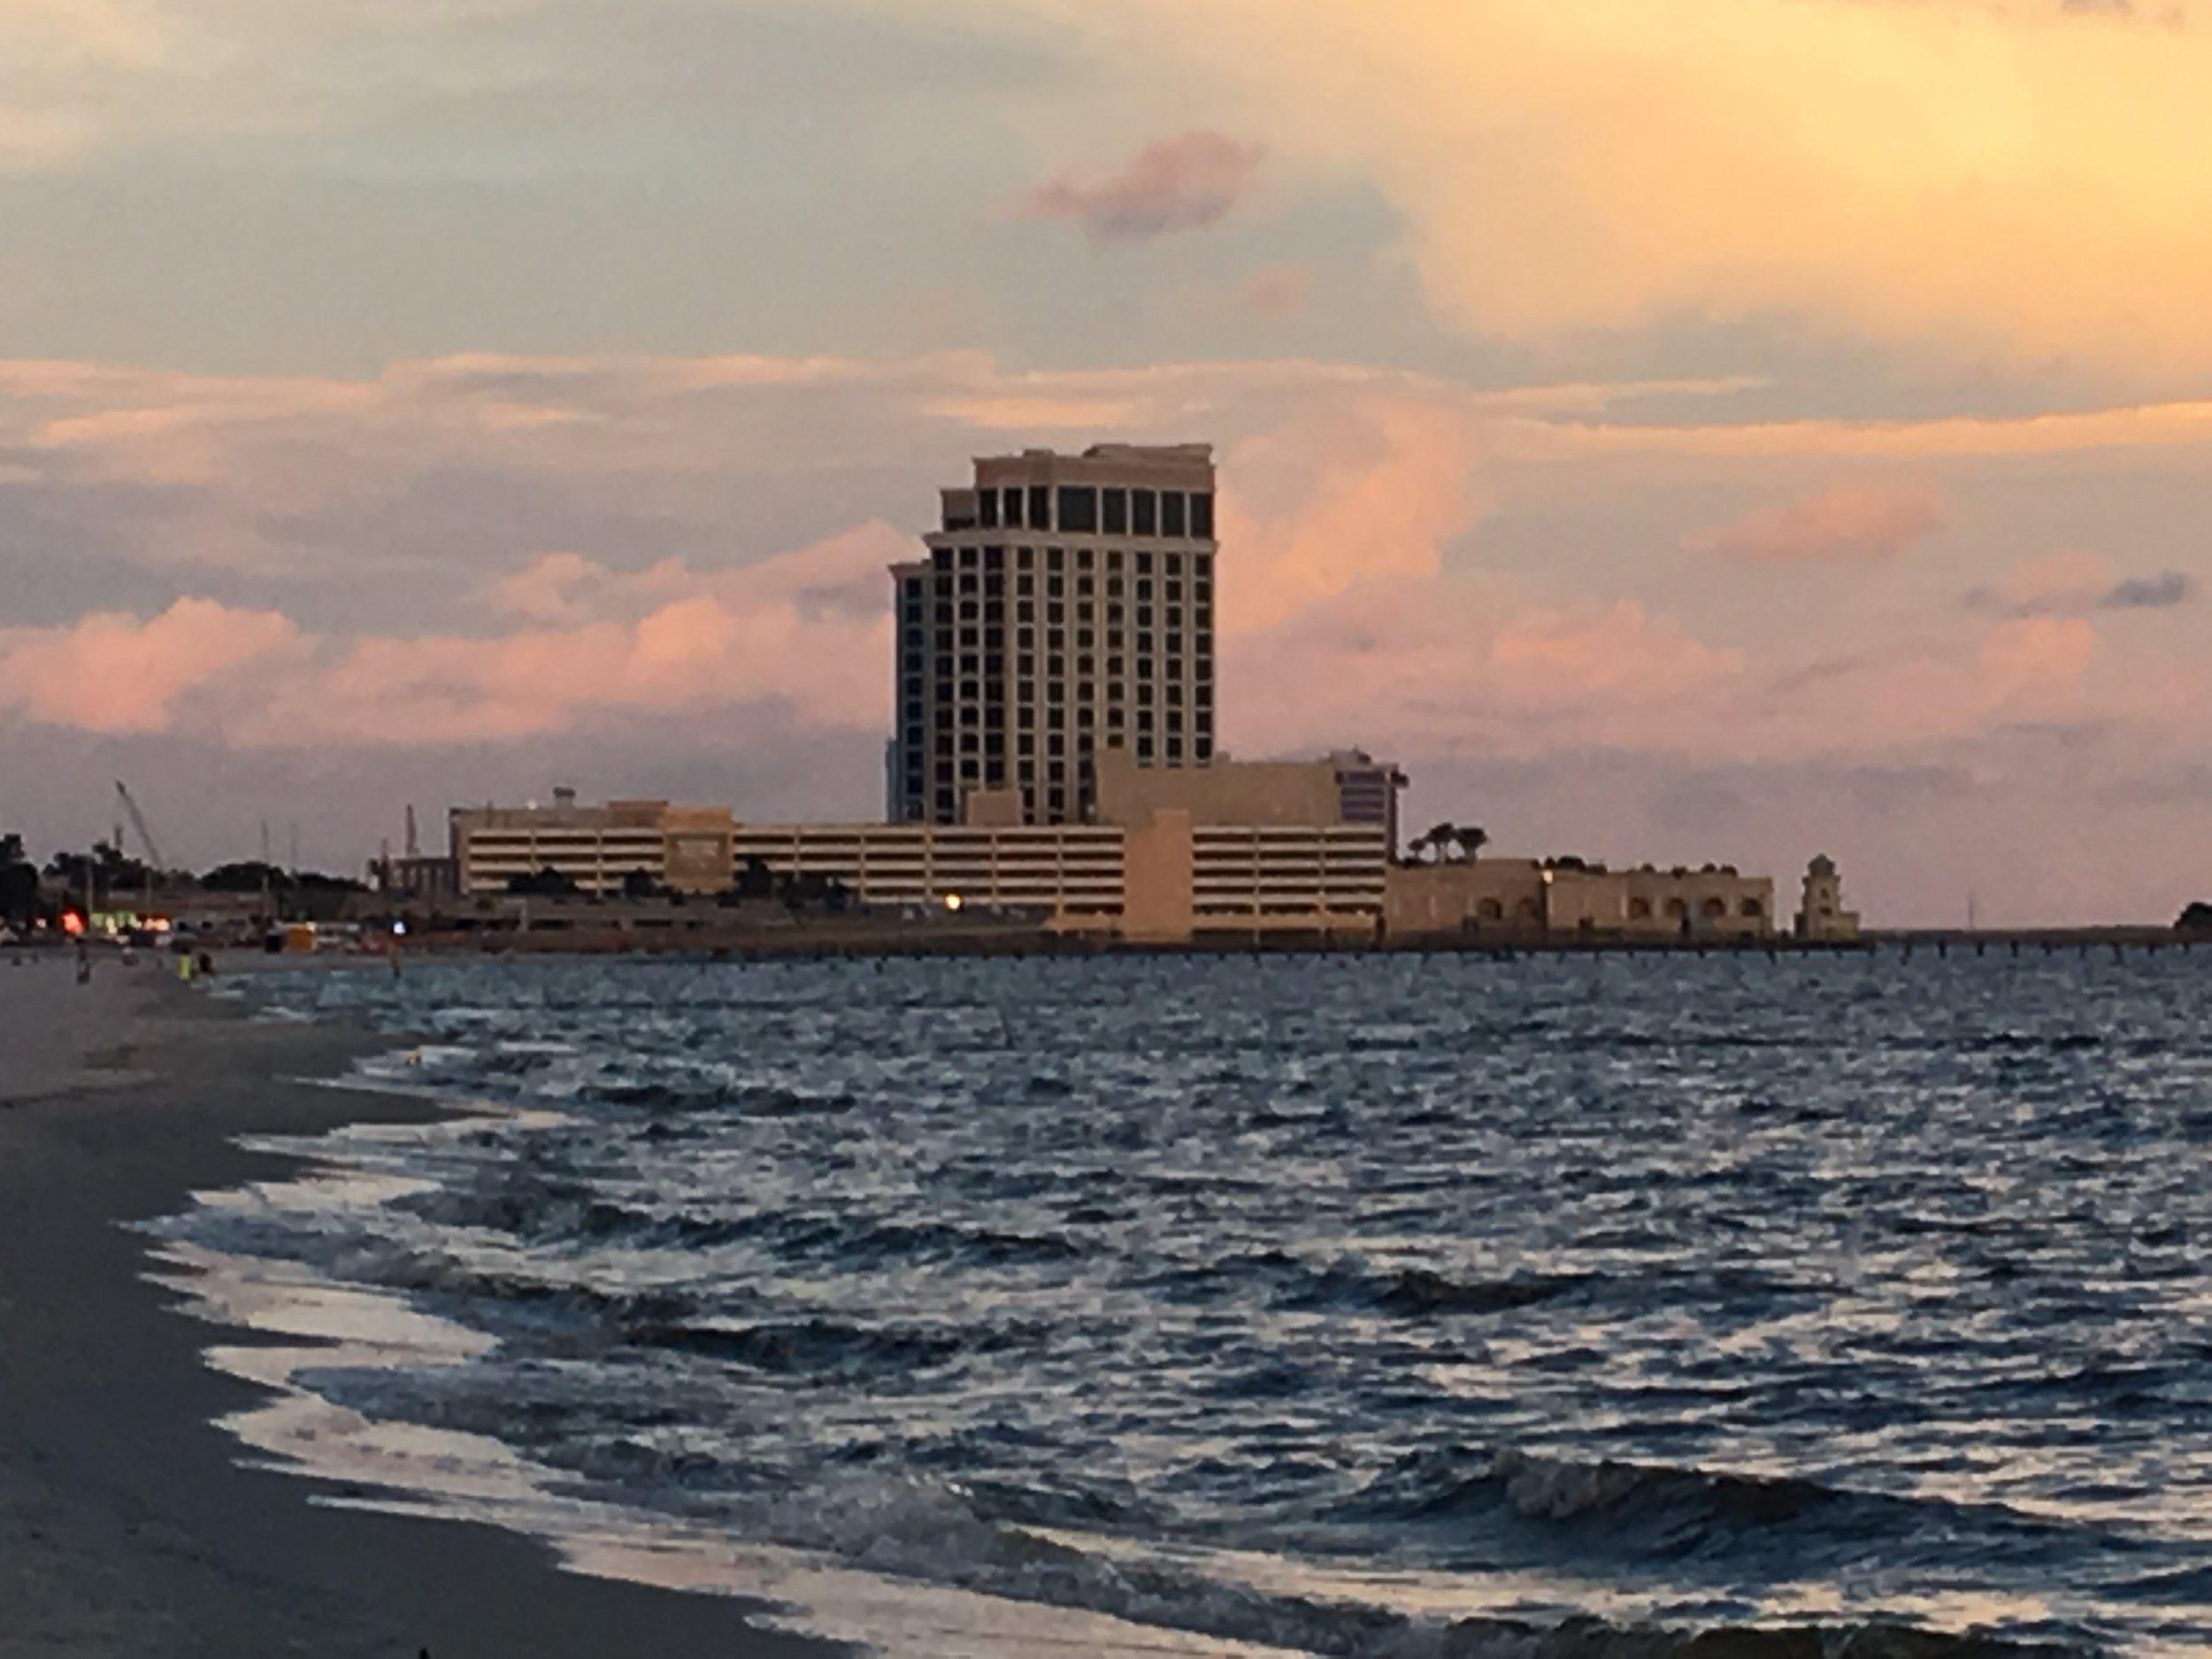 Sunset with hotel in Biloxi.JPG